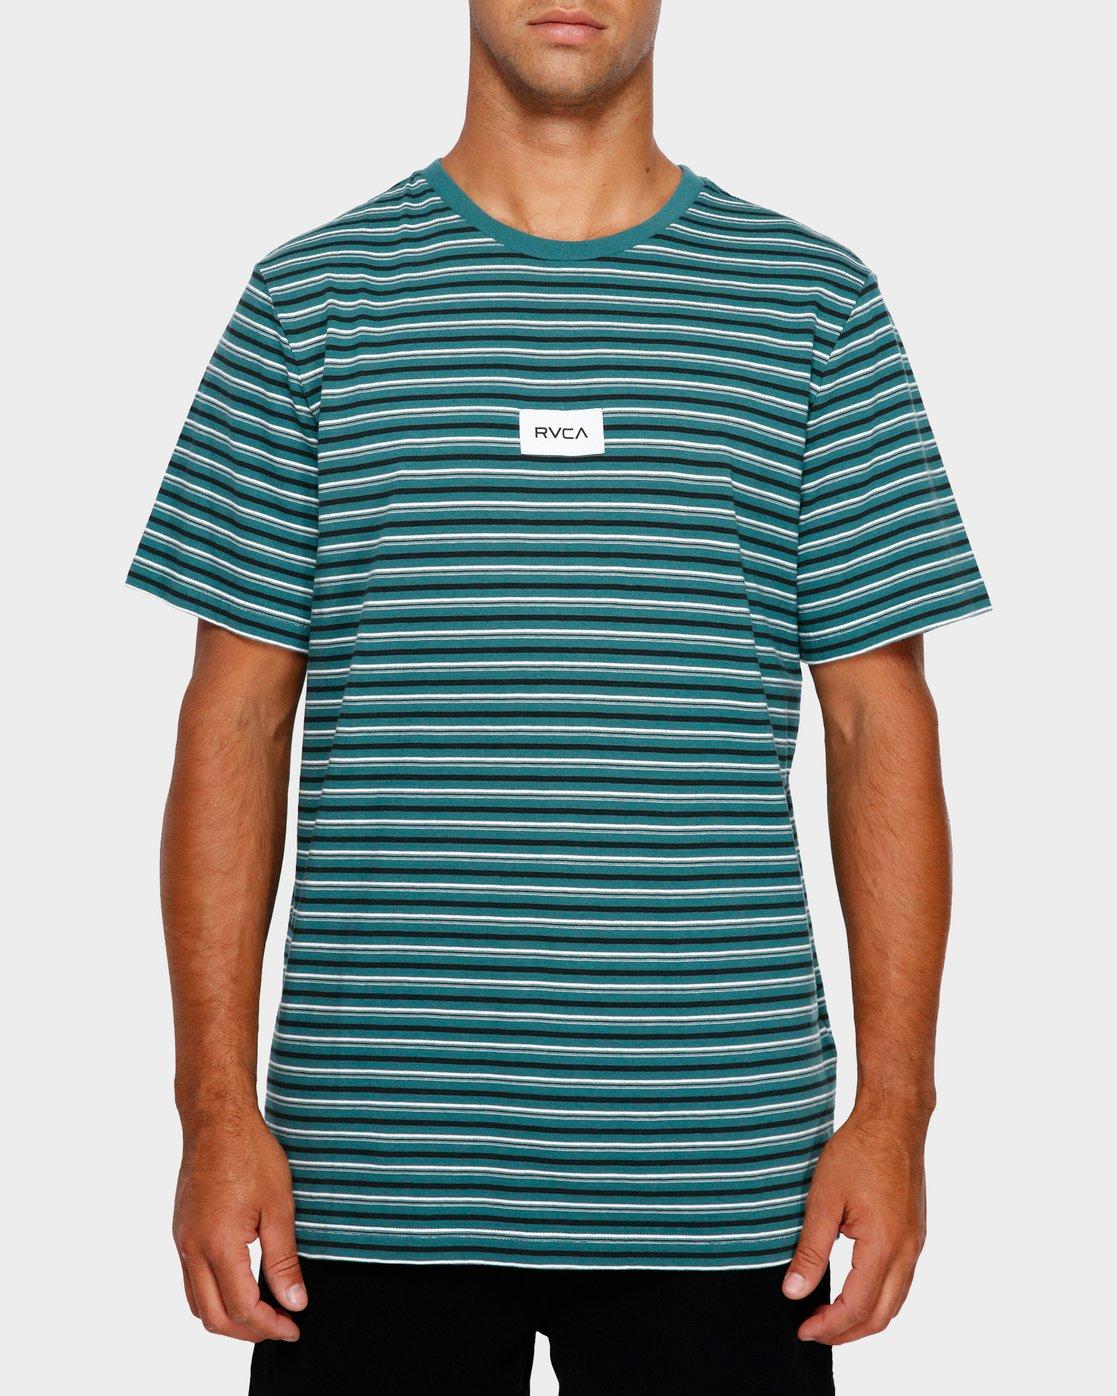 1 RVCA Focus Stripe T-Shirt Green R191049 RVCA